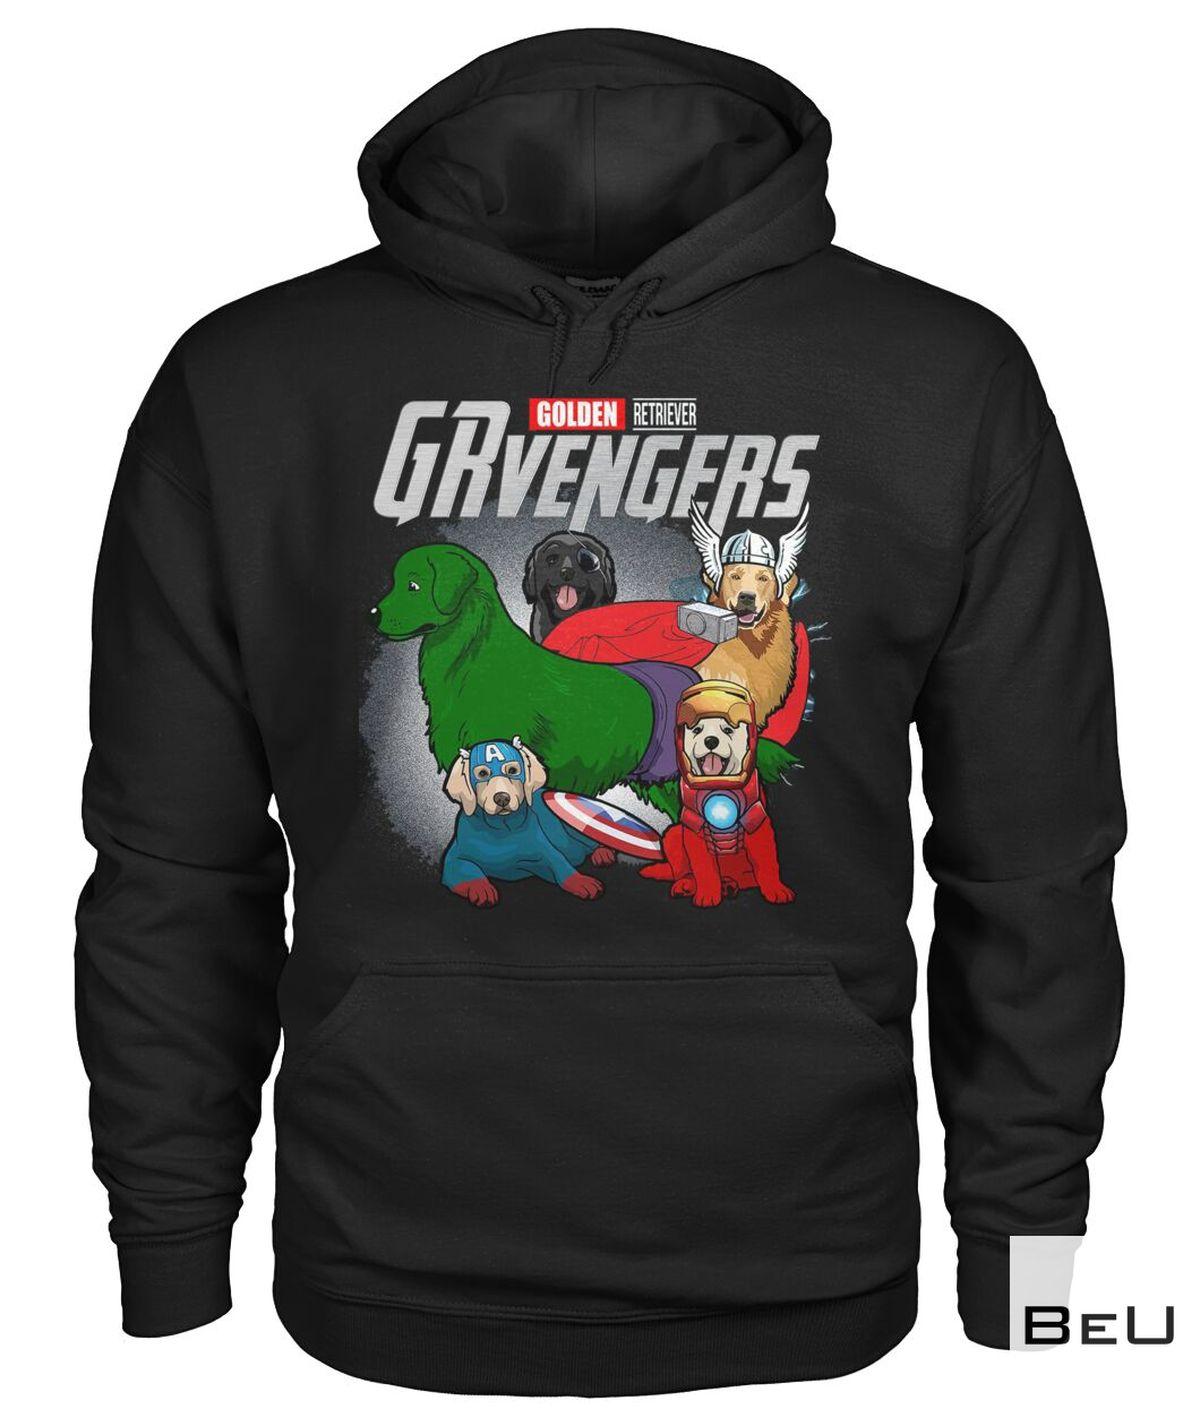 Golden Retriever GRvengers Avengers Shirtz